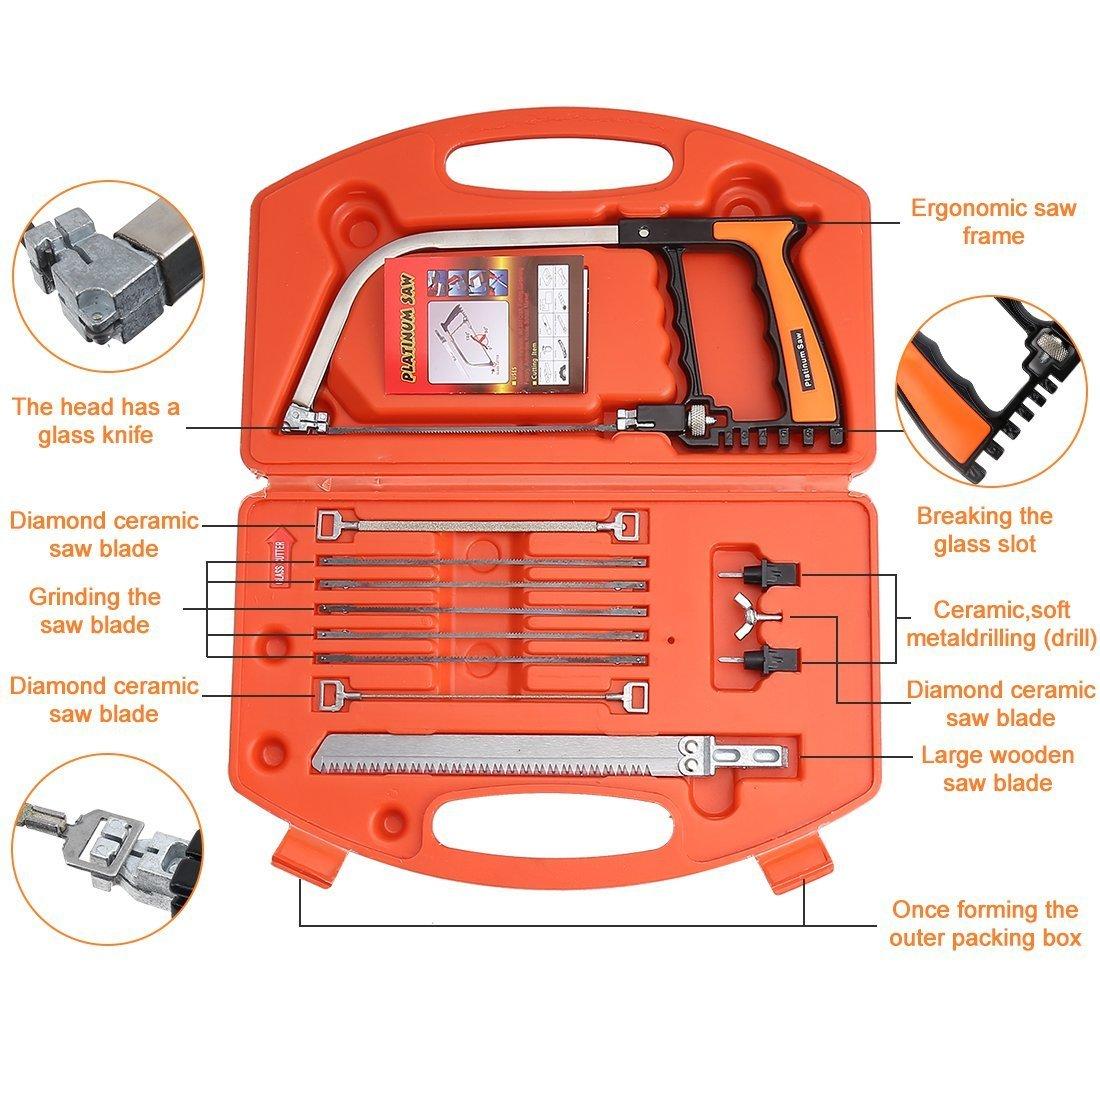 Handsaws Set, Four Fold Ruler, Multifunction Bow Saw +Angle Measuring Ruler for Engineer Handymen Builders Craftsmen by SILIVN by SILIVN (Image #3)